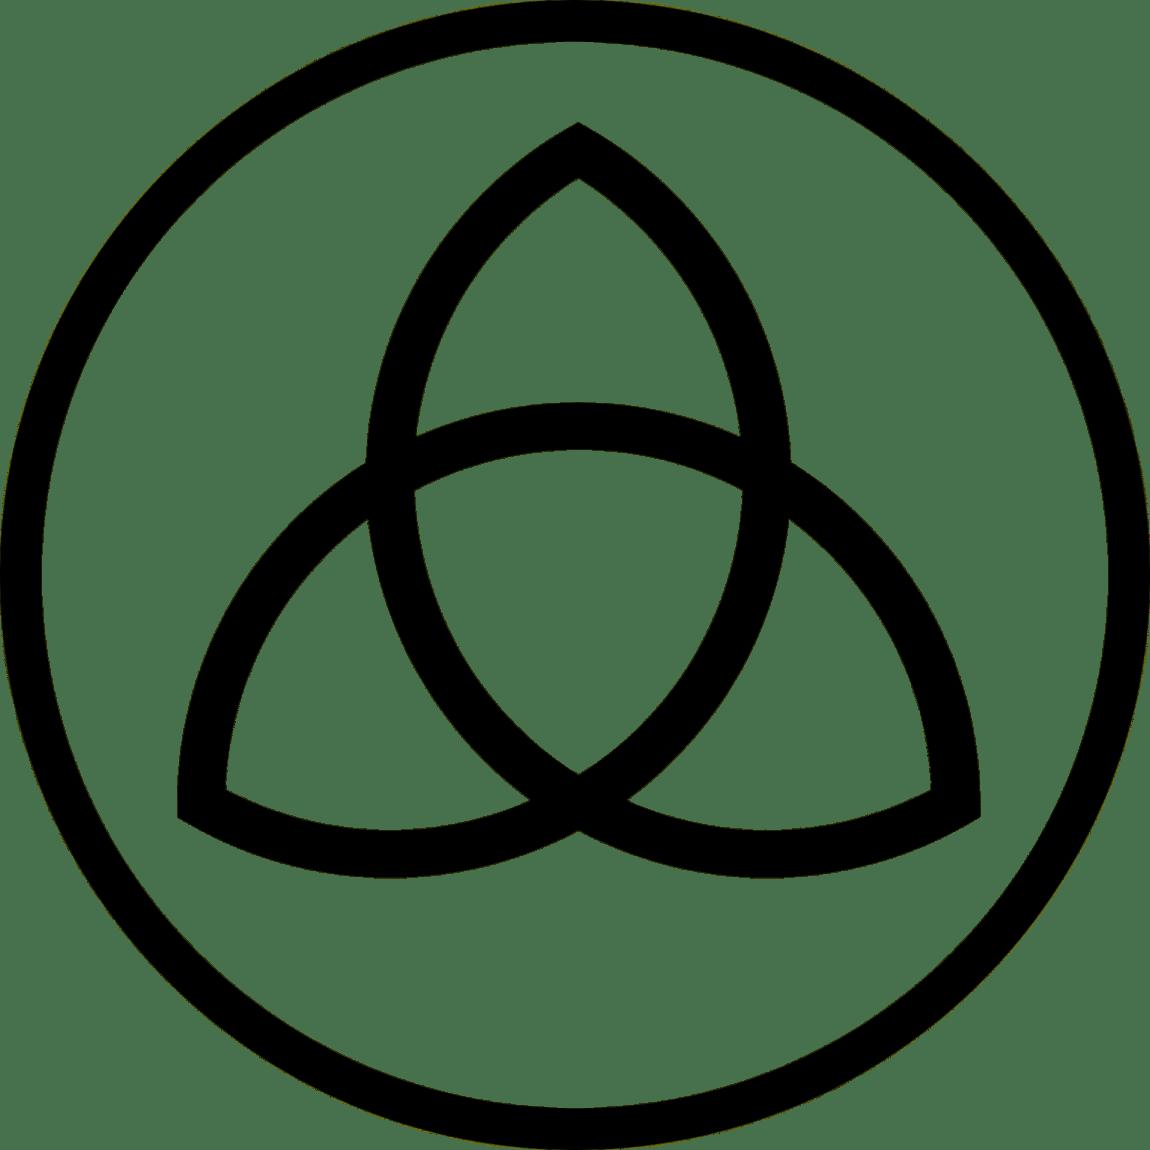 The Sunday of the Holy Trinity: June 16, 2019